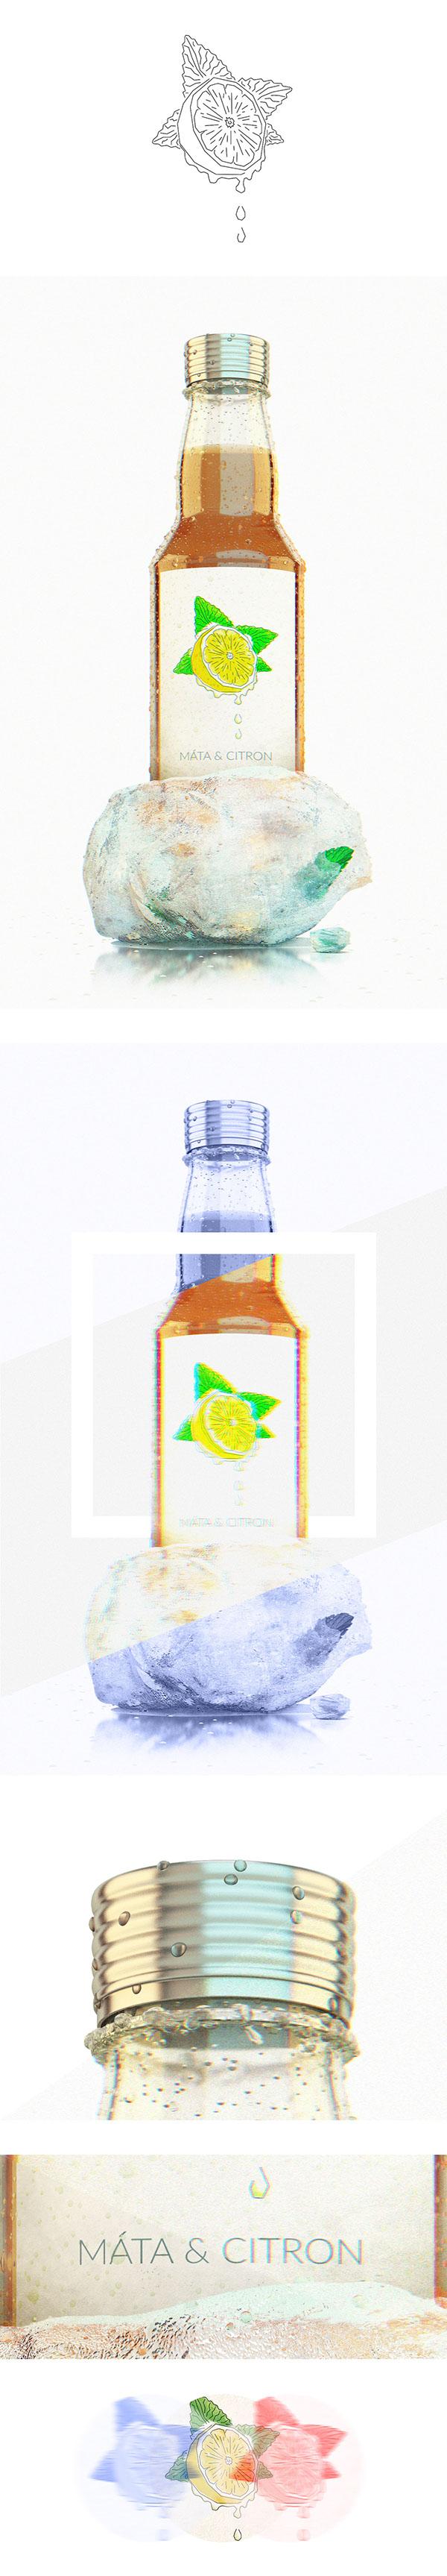 bottle syrup package mint & lemon 3ds max corona Quokka Czech Vizualization